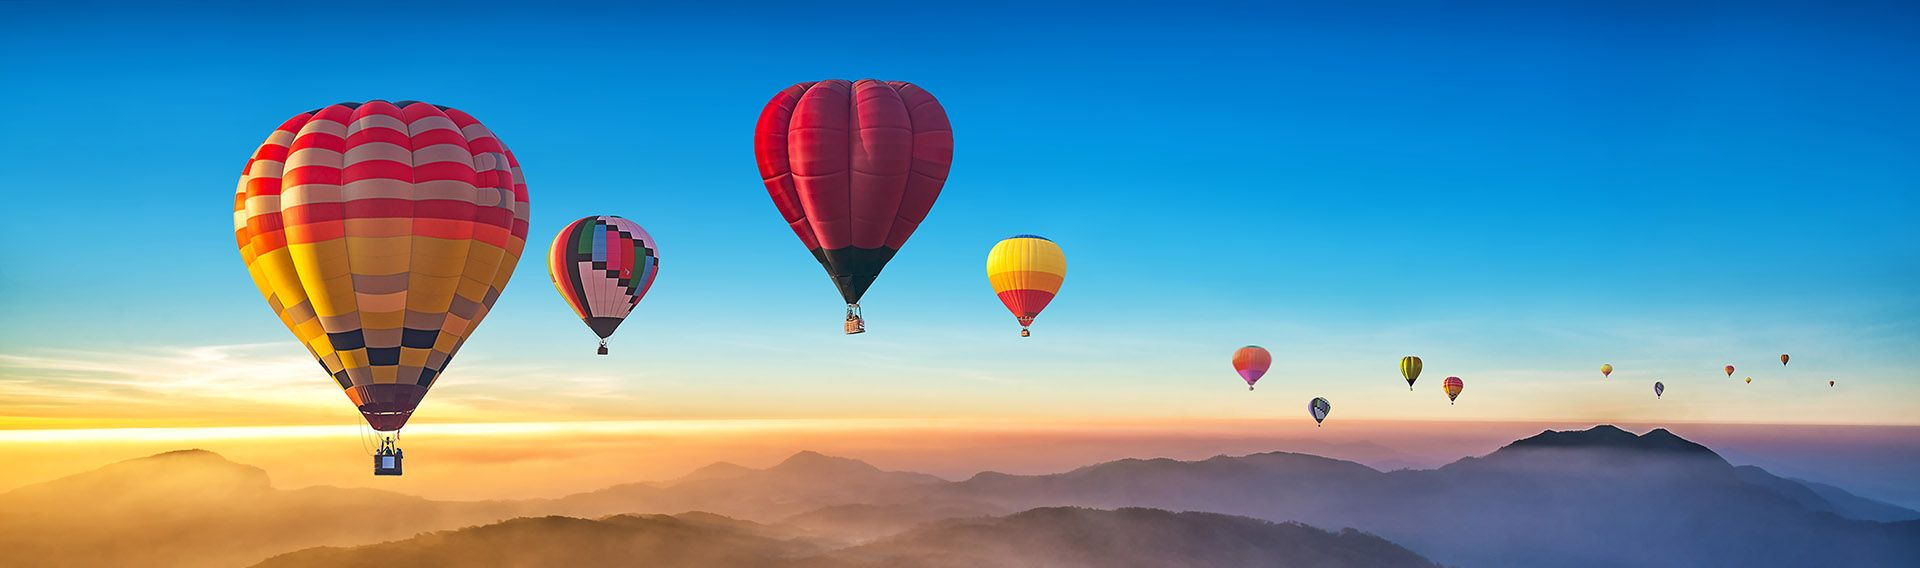 Sri Lanka, vol en montgolfière